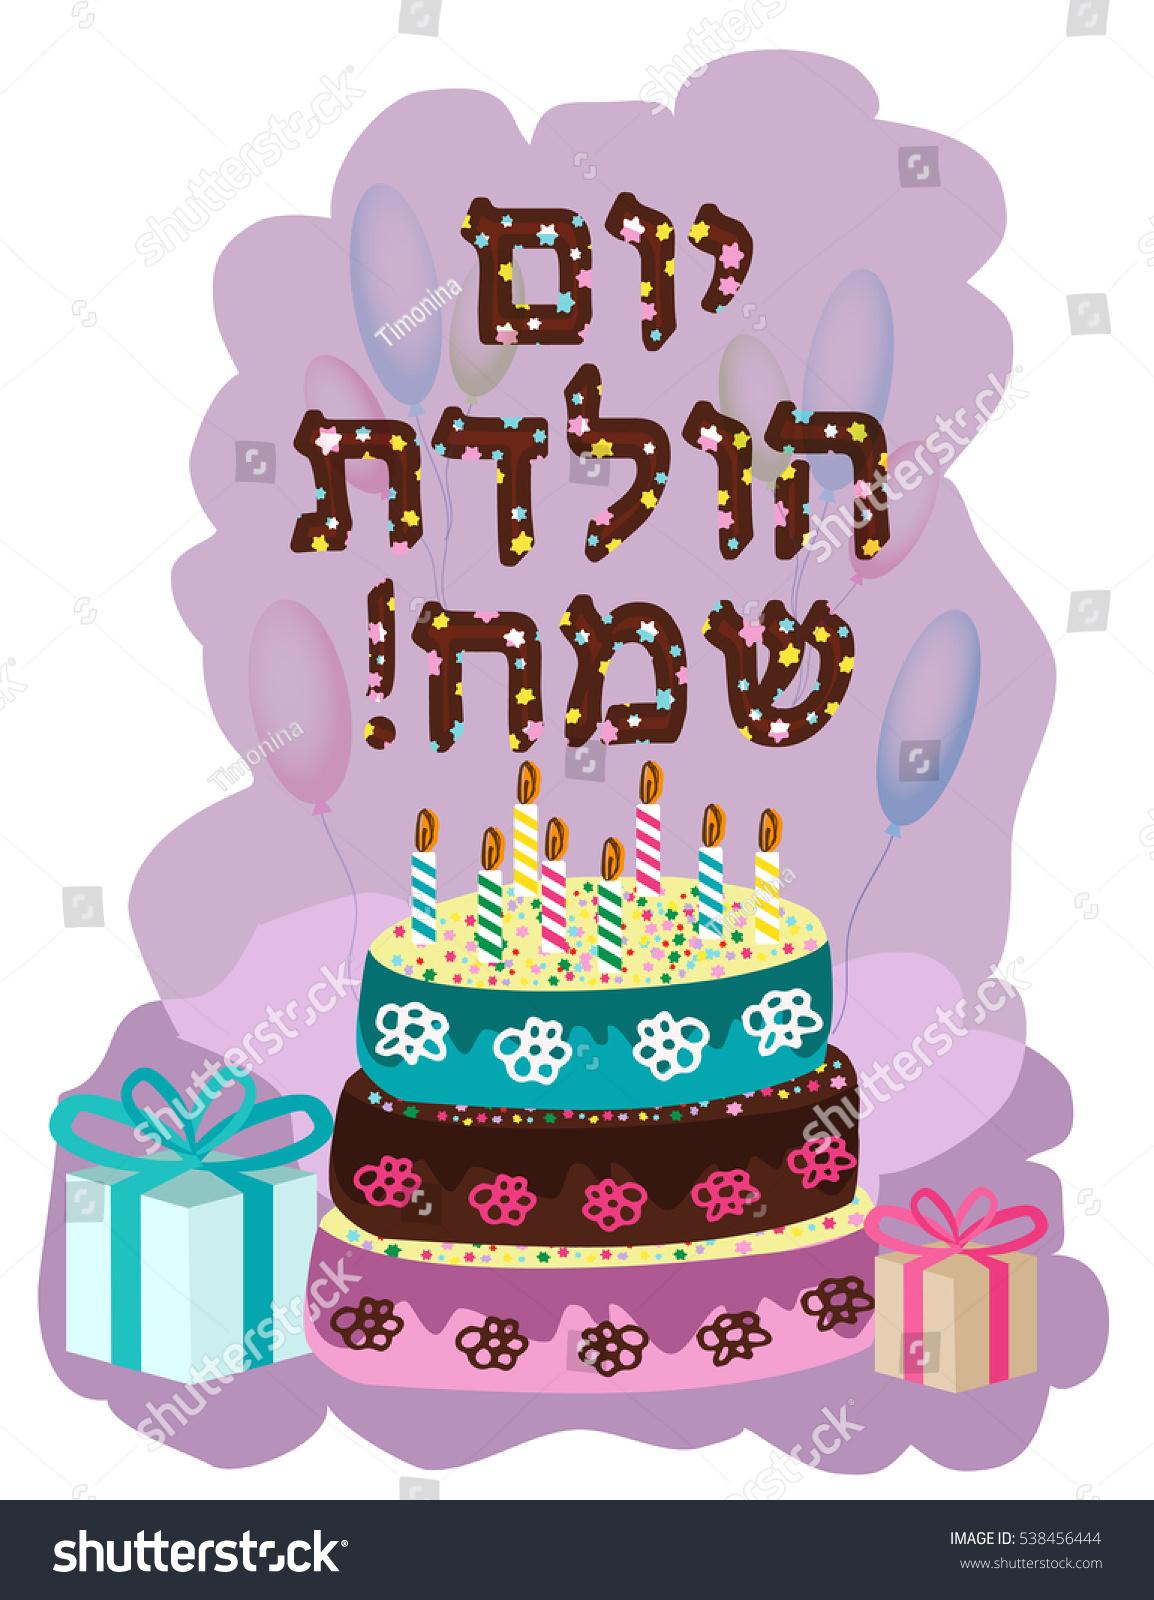 Beautiful chocolate cake birthday candles inscription stock vector beautiful chocolate cake with birthday candles the inscription in hebrew hayom yom huledet balloons kristyandbryce Images